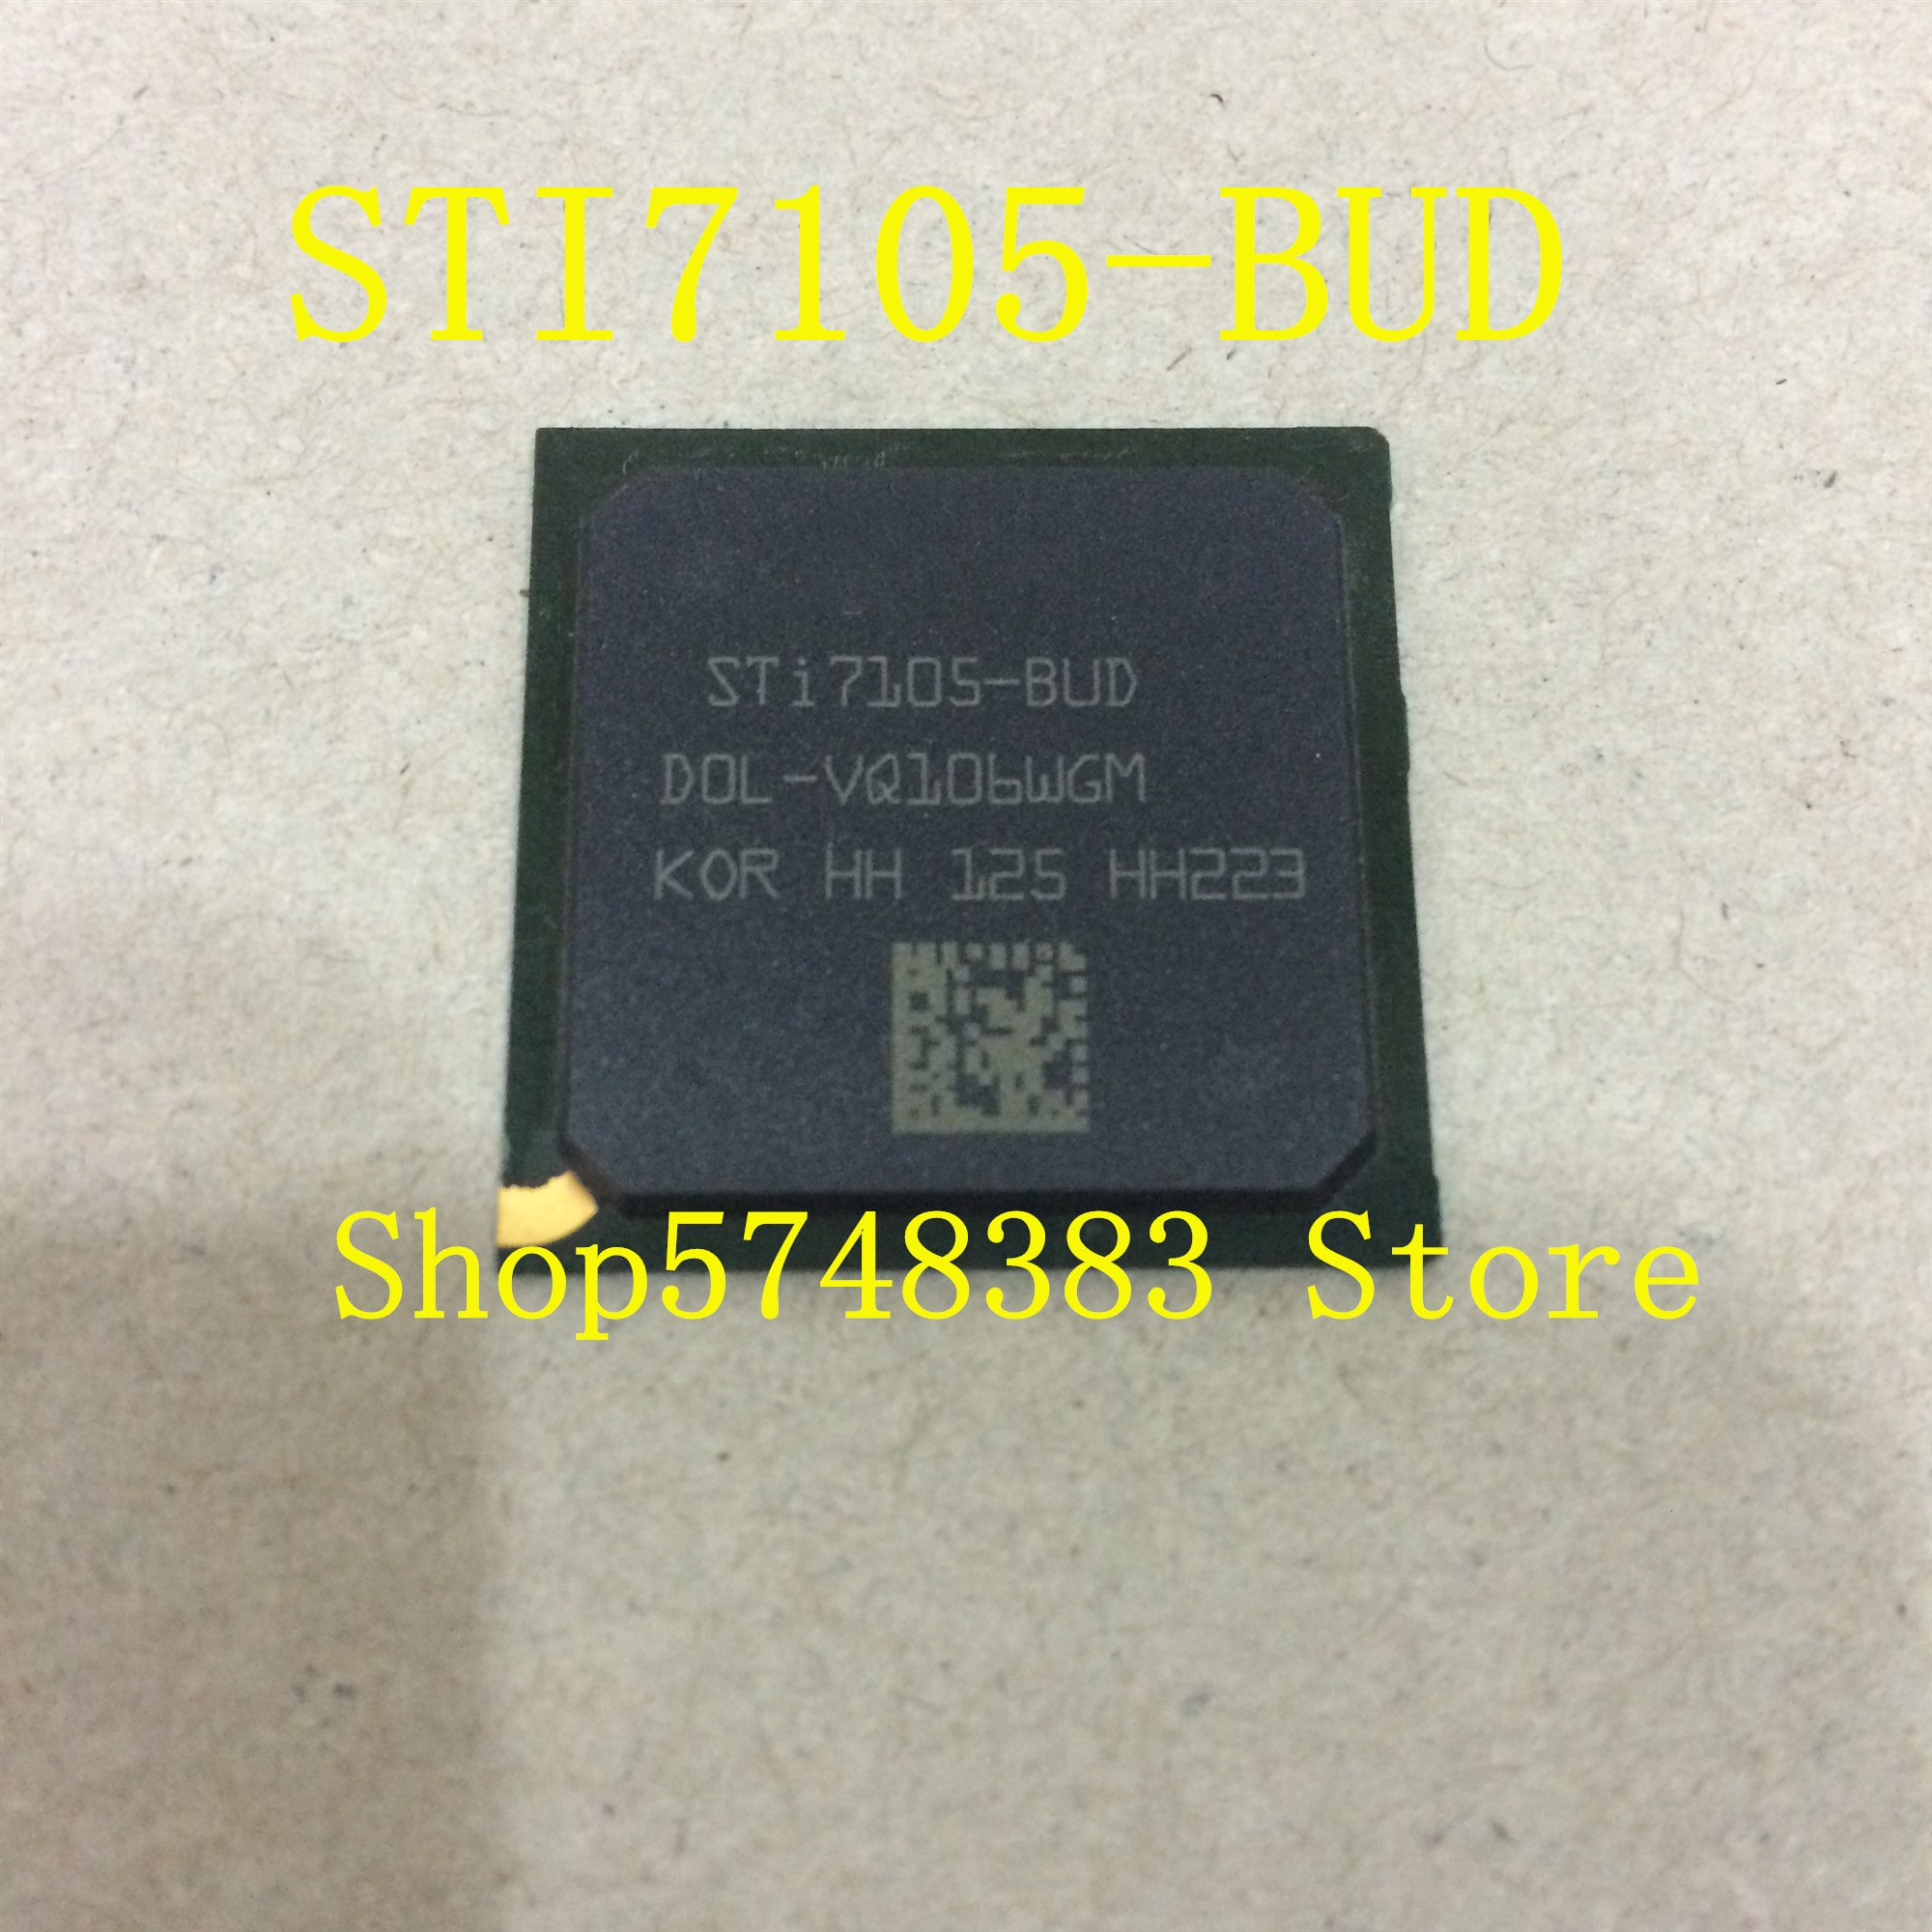 1PCS/LOT new original  STI7105 STI7105-BUD STI7105BUD BGA Optical network set-top box chip